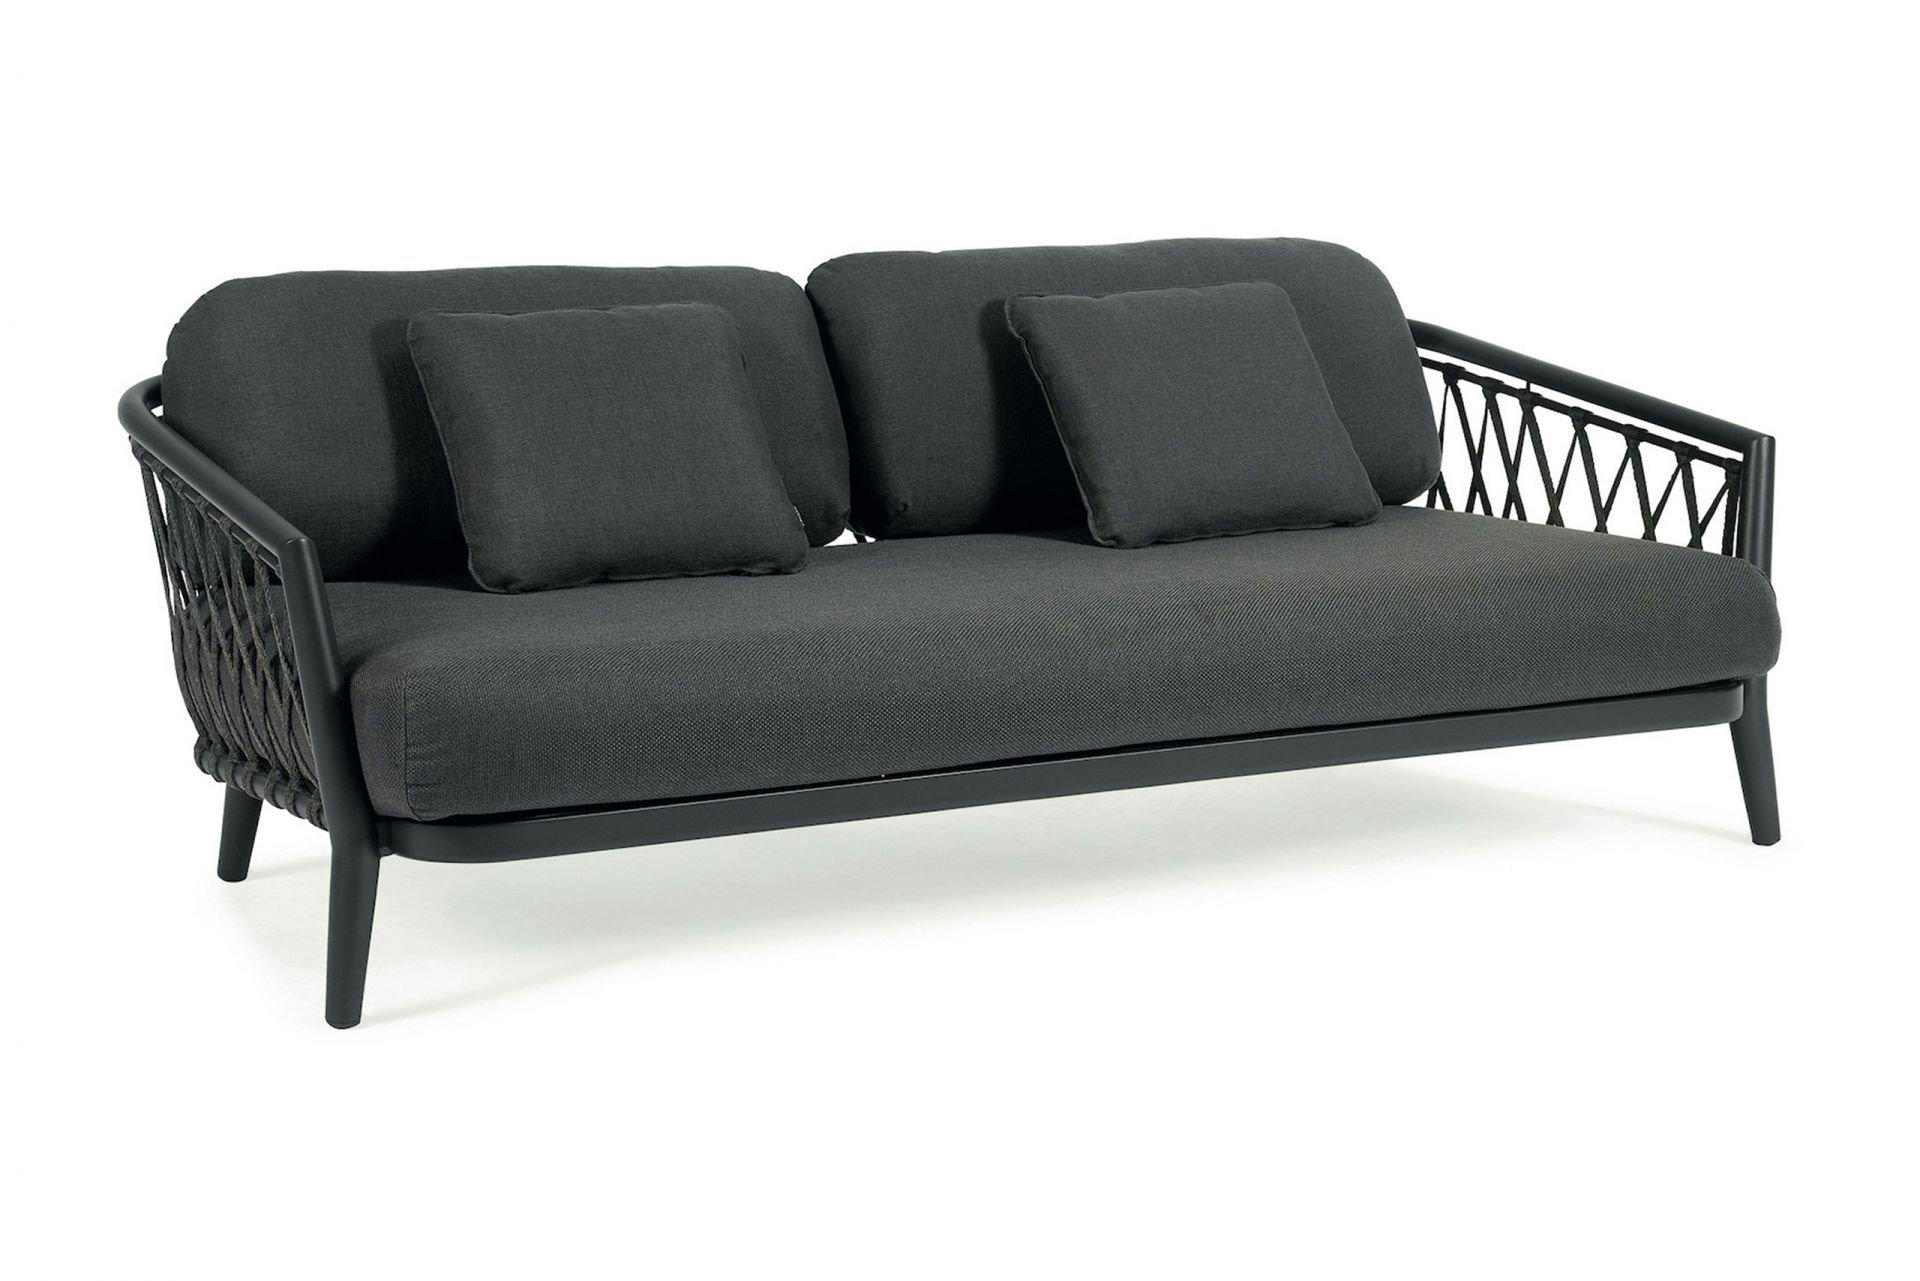 BARCELONA 2-Sitzer